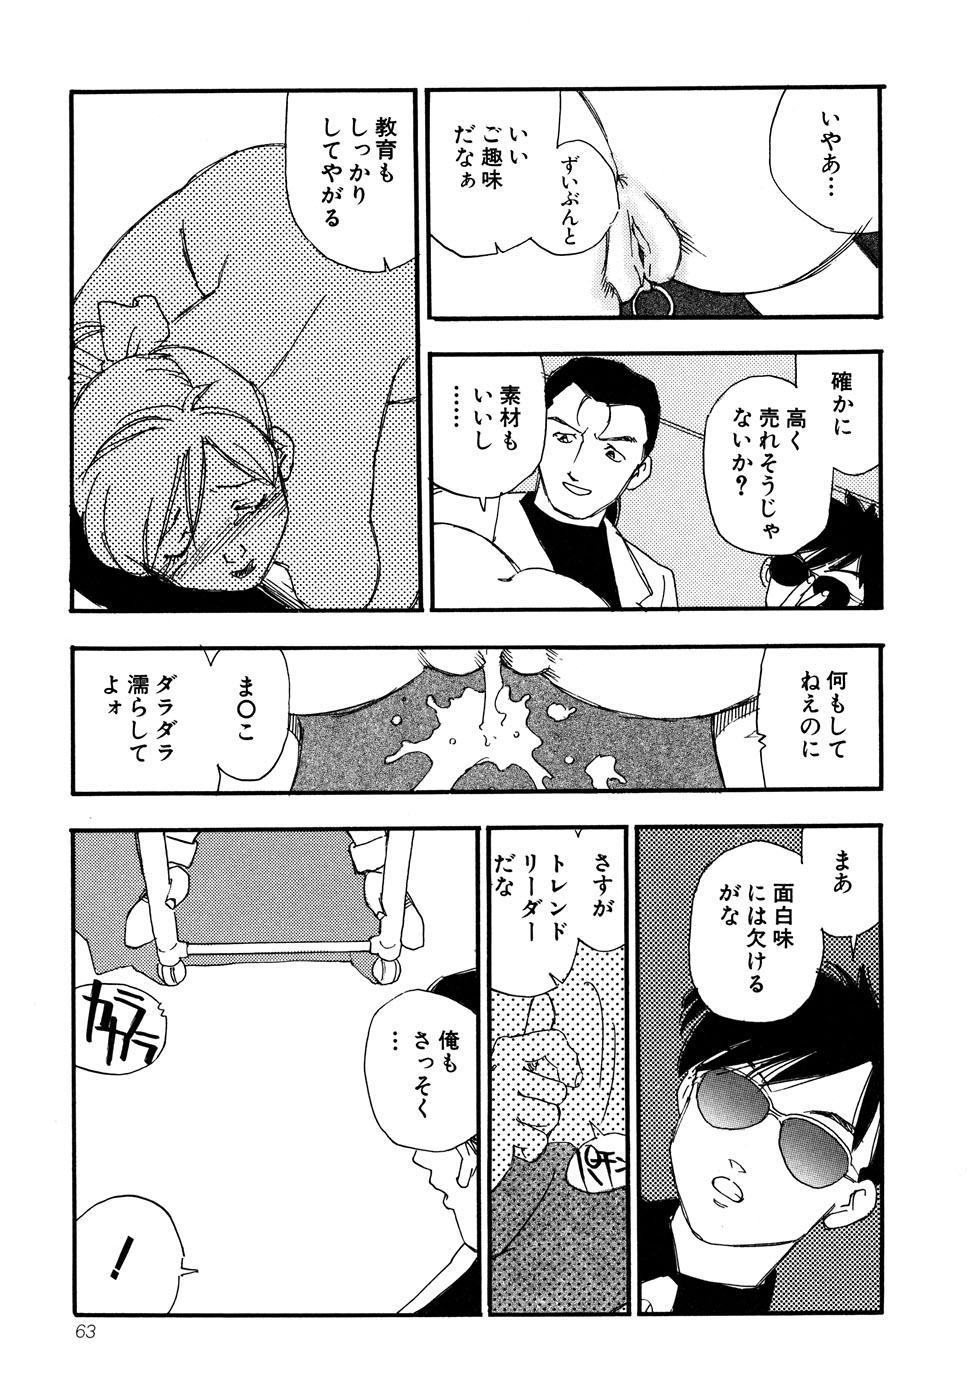 G-drive Vol.1 Ryoujokuhen 62